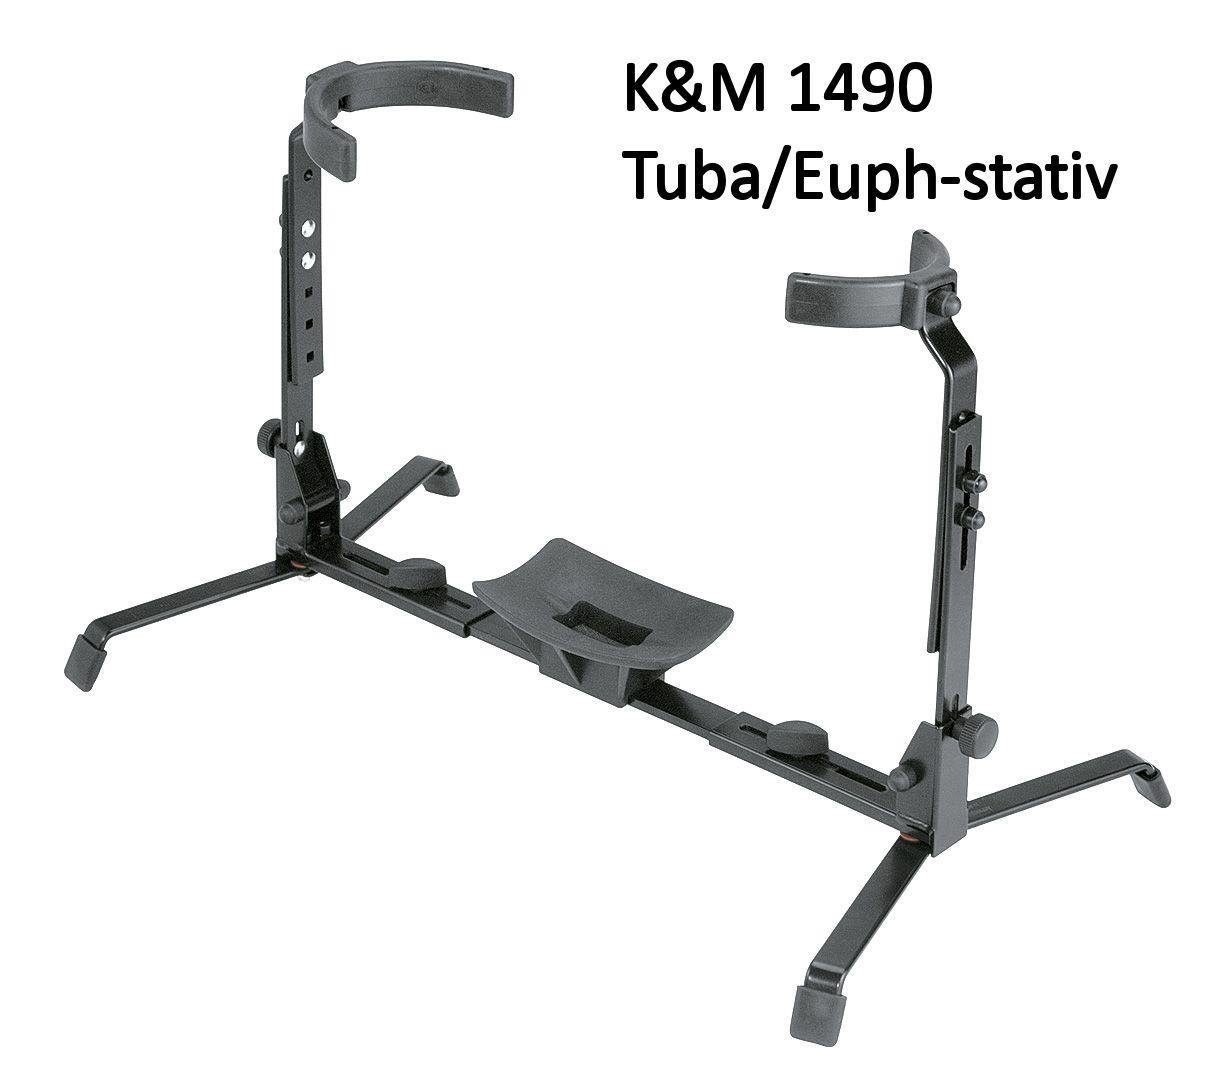 K&M Euphonium/Tuba stand 14940 275-455mm